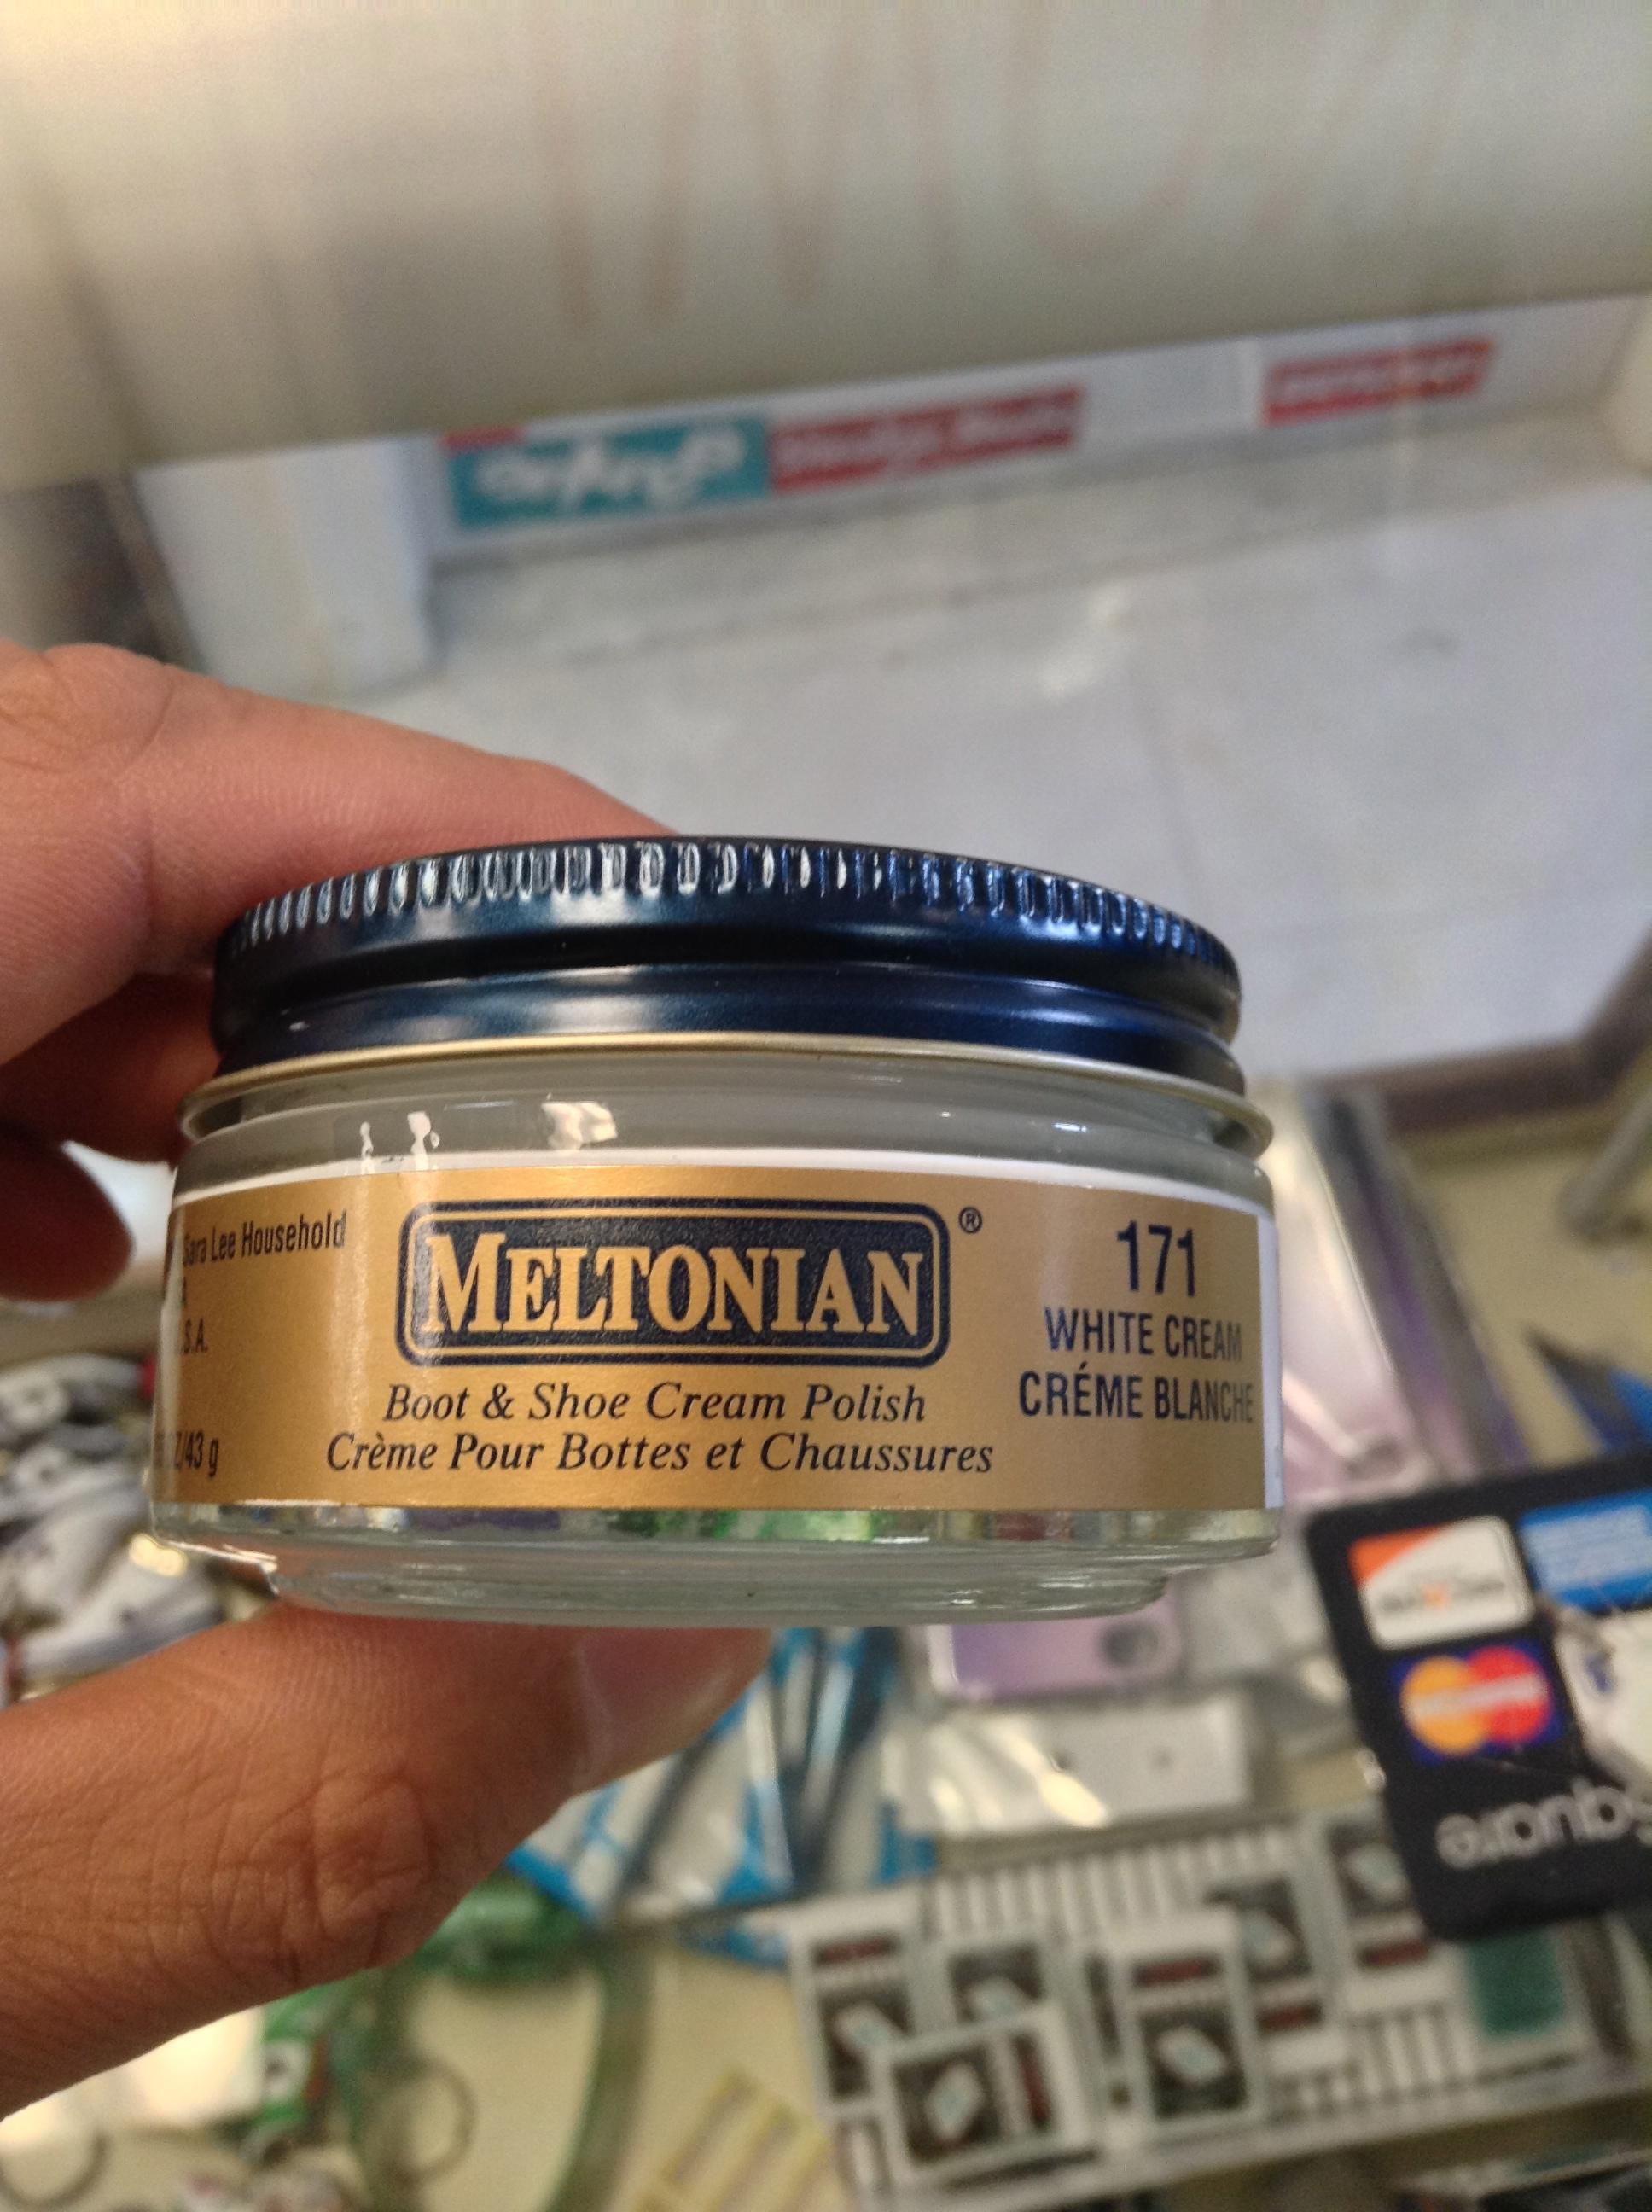 f03777cabee75 Meltonian Boot & Shoe Cream Polish White #171